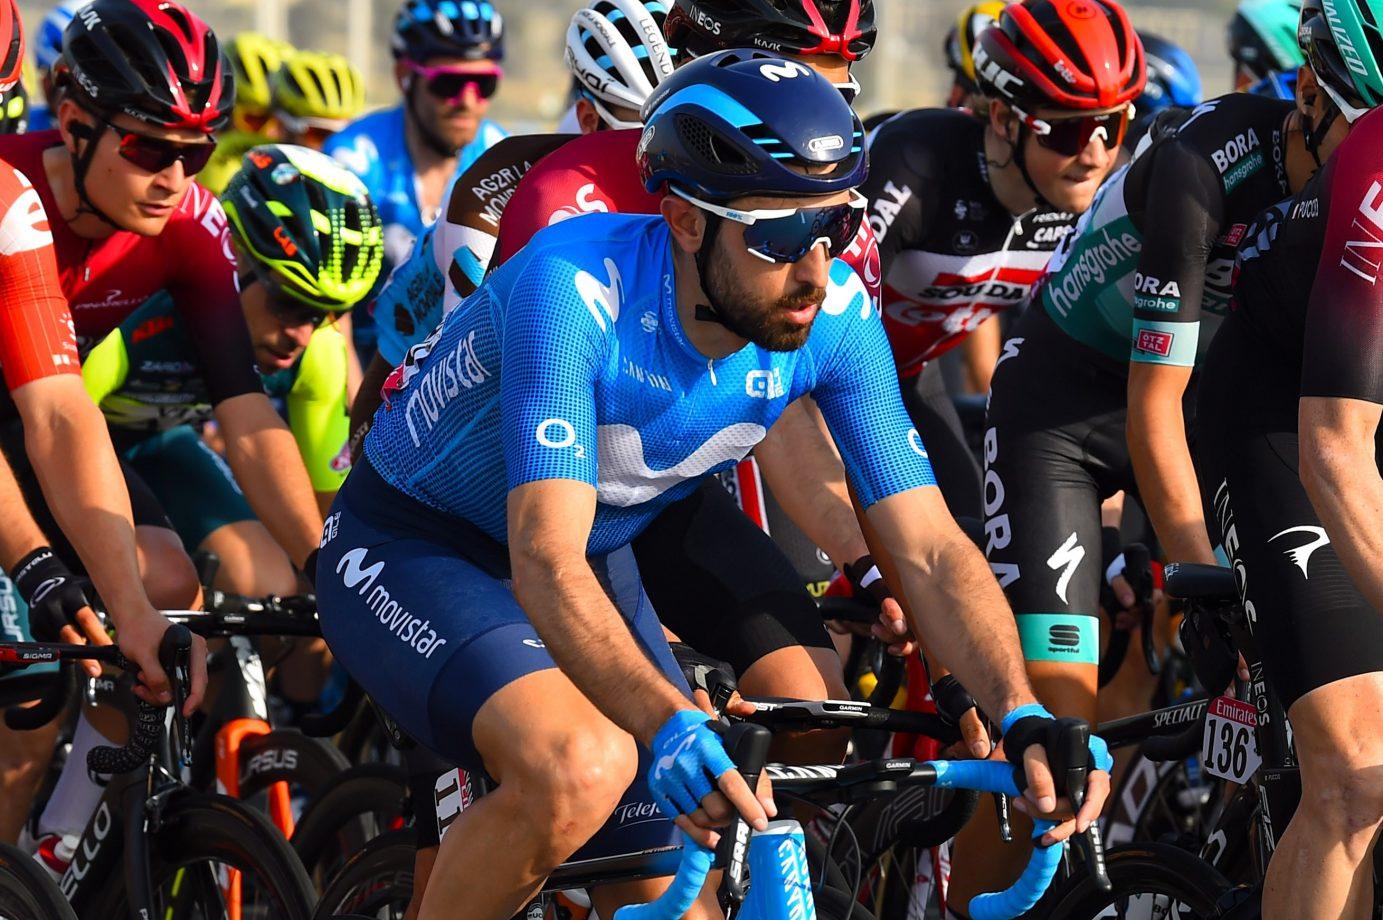 Imagen de la noticia 'Movistar Team Talks: Dario Cataldo and the invaluable experience of a WorldTour superdomestique'